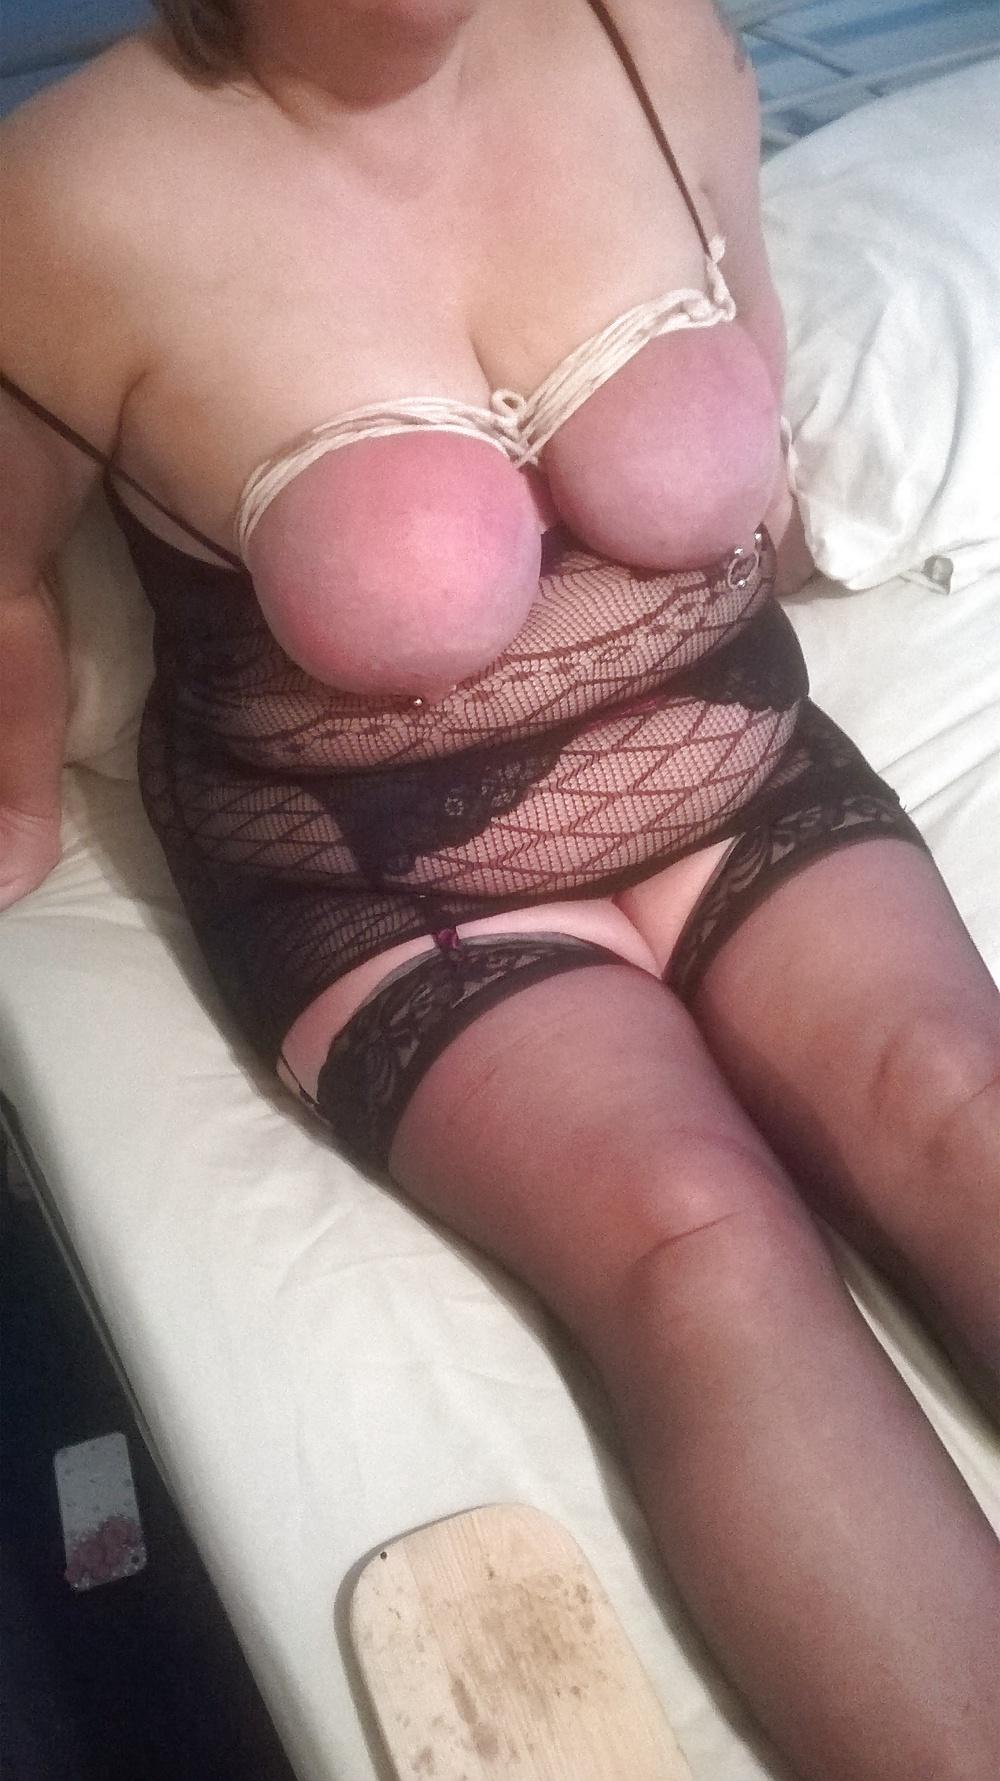 Scottish slut , even more tit !